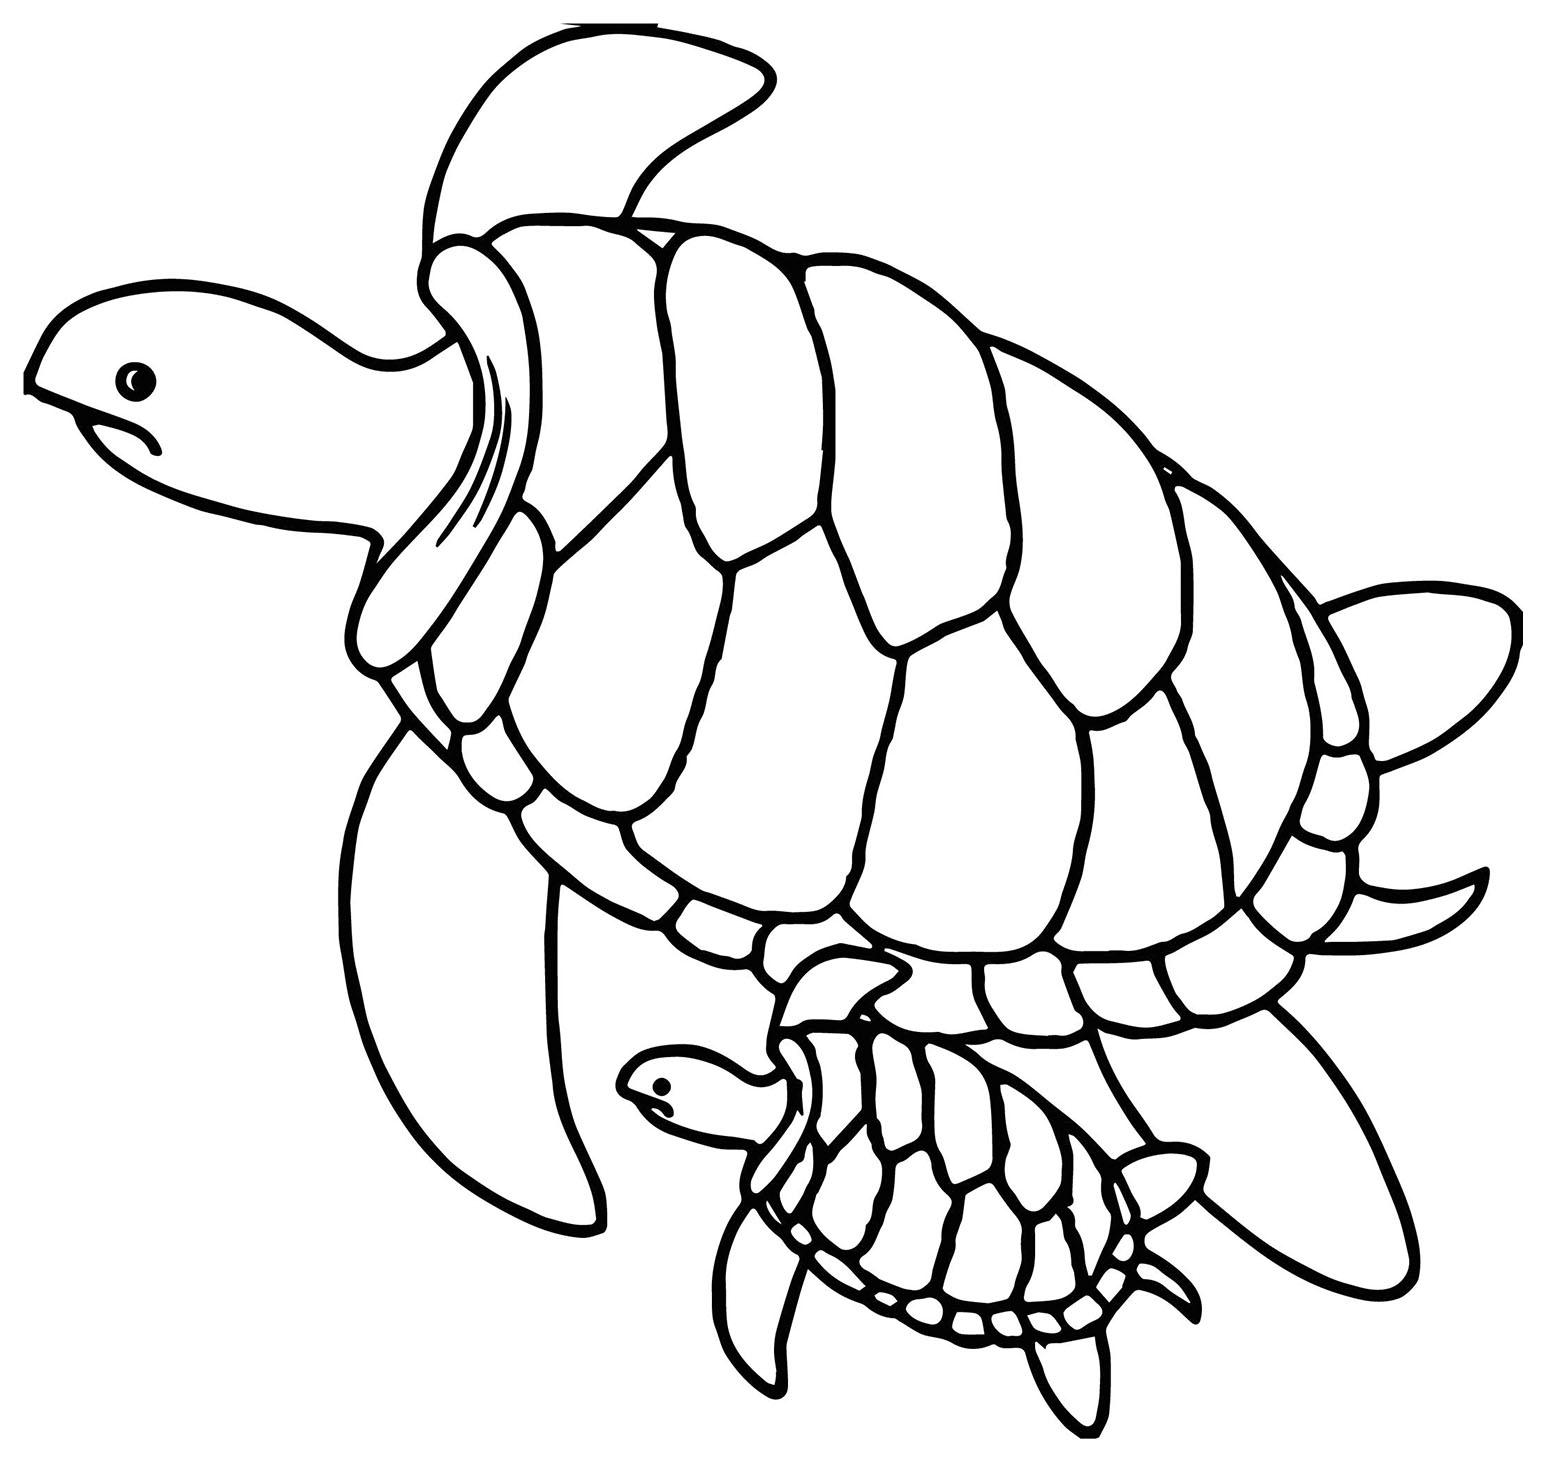 Turtles to print - Turtles Kids Coloring Pages